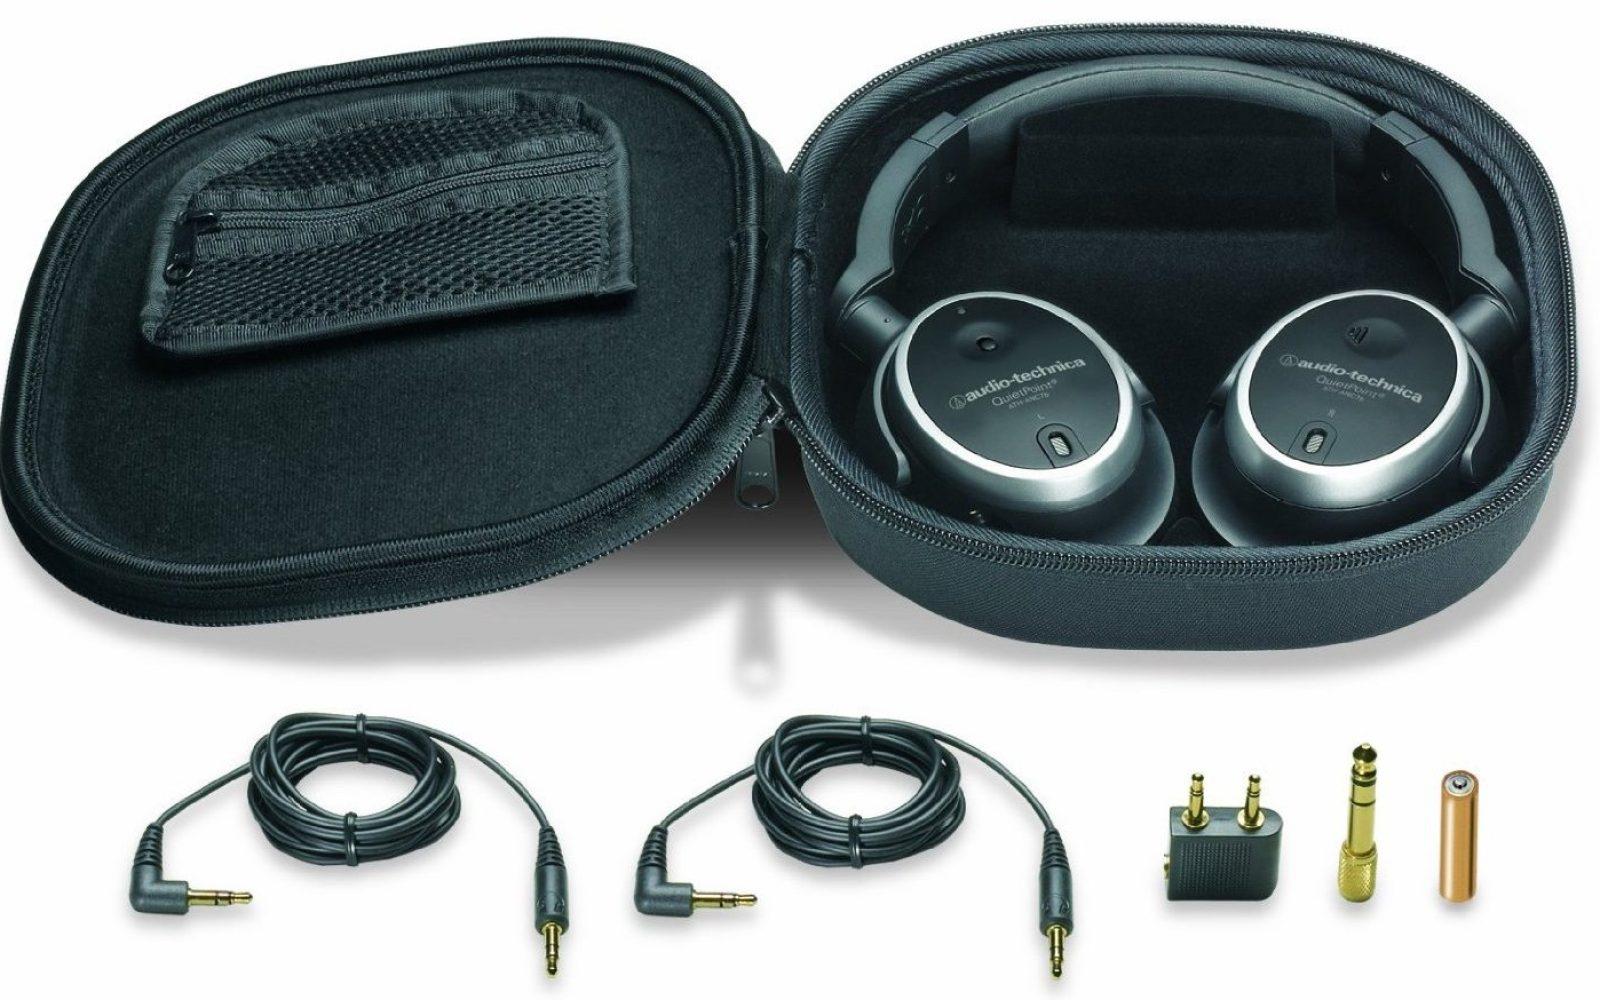 c0509ebf33d Headphones: Audio-Technica QuietPoint over-ears $100 (Reg. $150+),  Sennheiser HD 202 on-ears $15 (Reg. $24), more